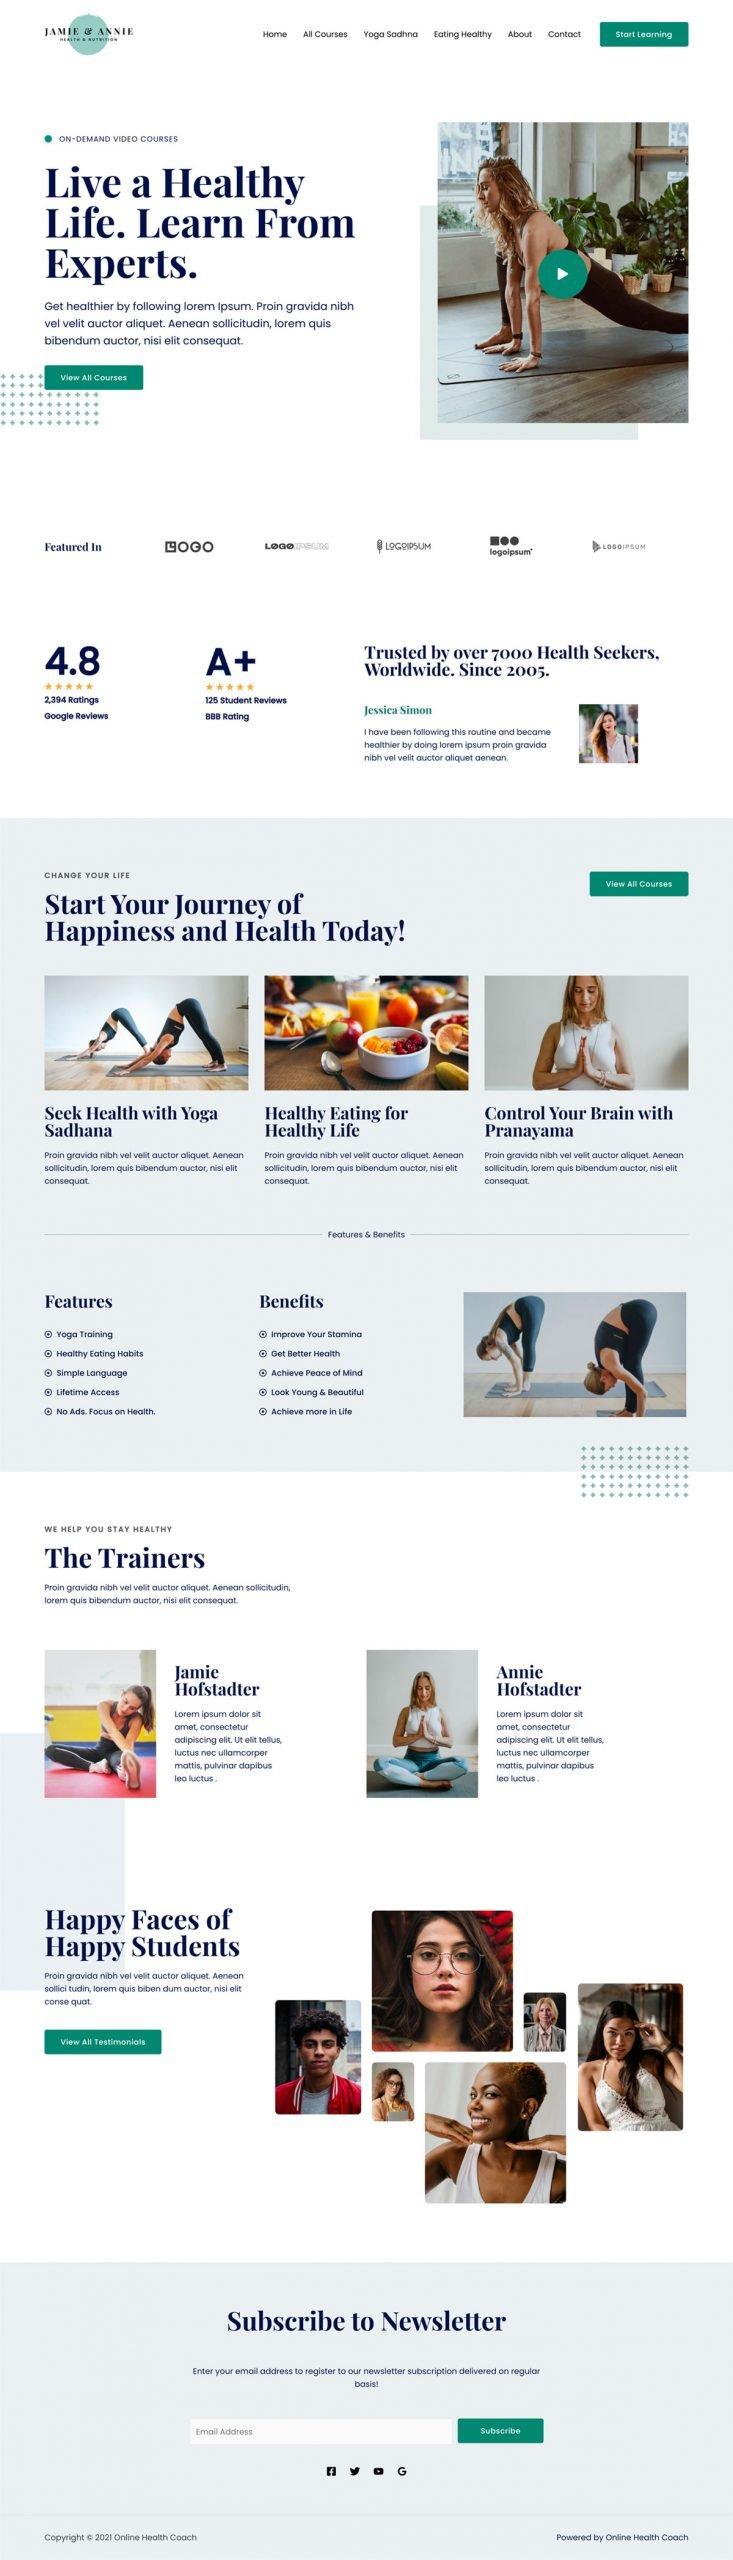 Adamo Web Design | Web Design Durham | online health coach 02 home scaled